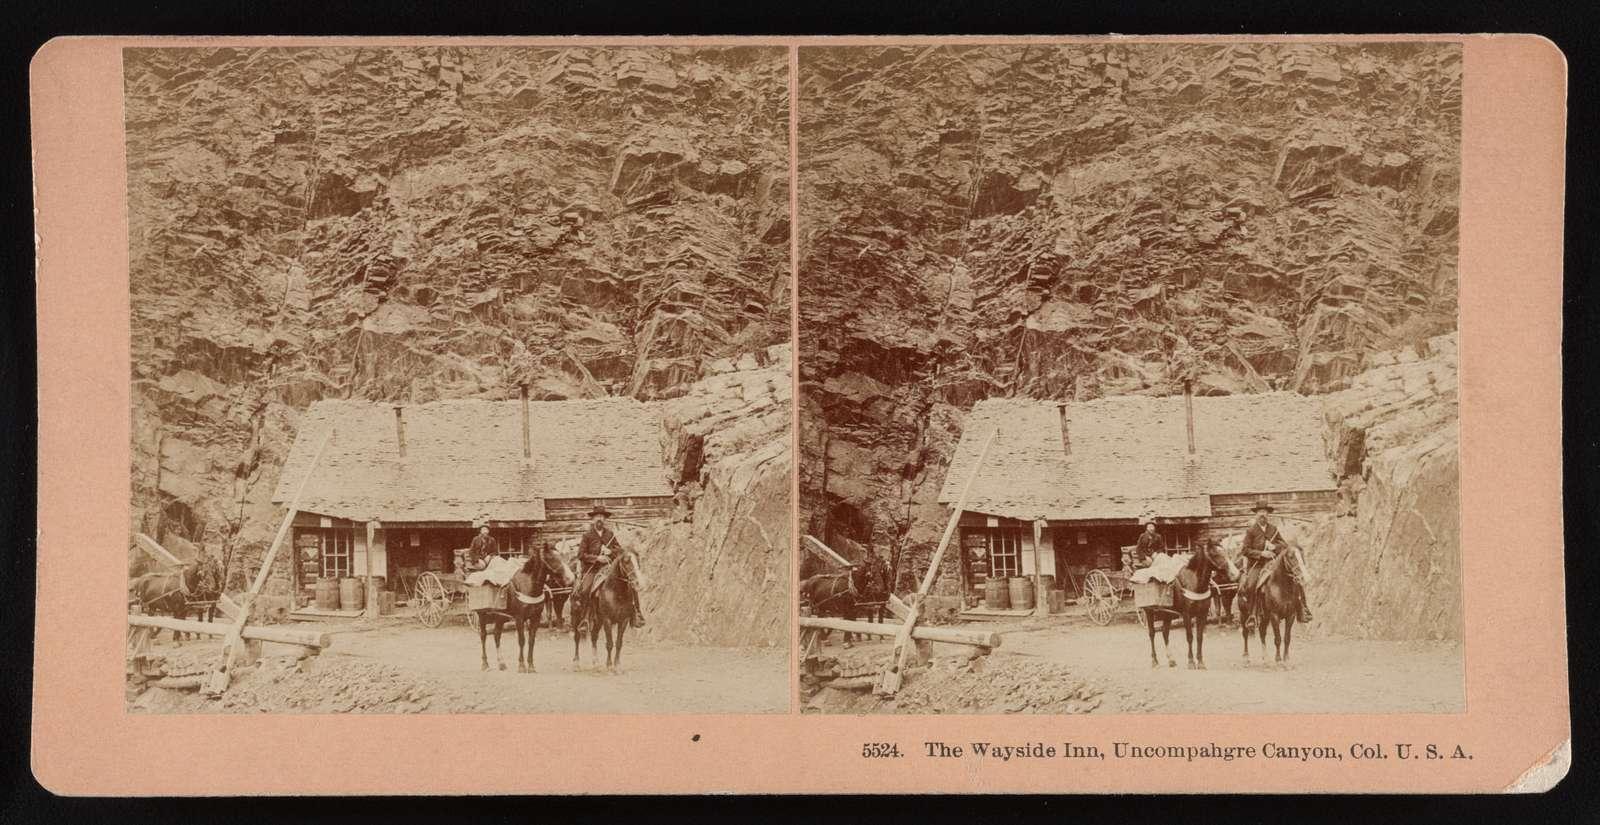 The Wayside Inn, Uncompahgre Canyon, Col. U.S.A